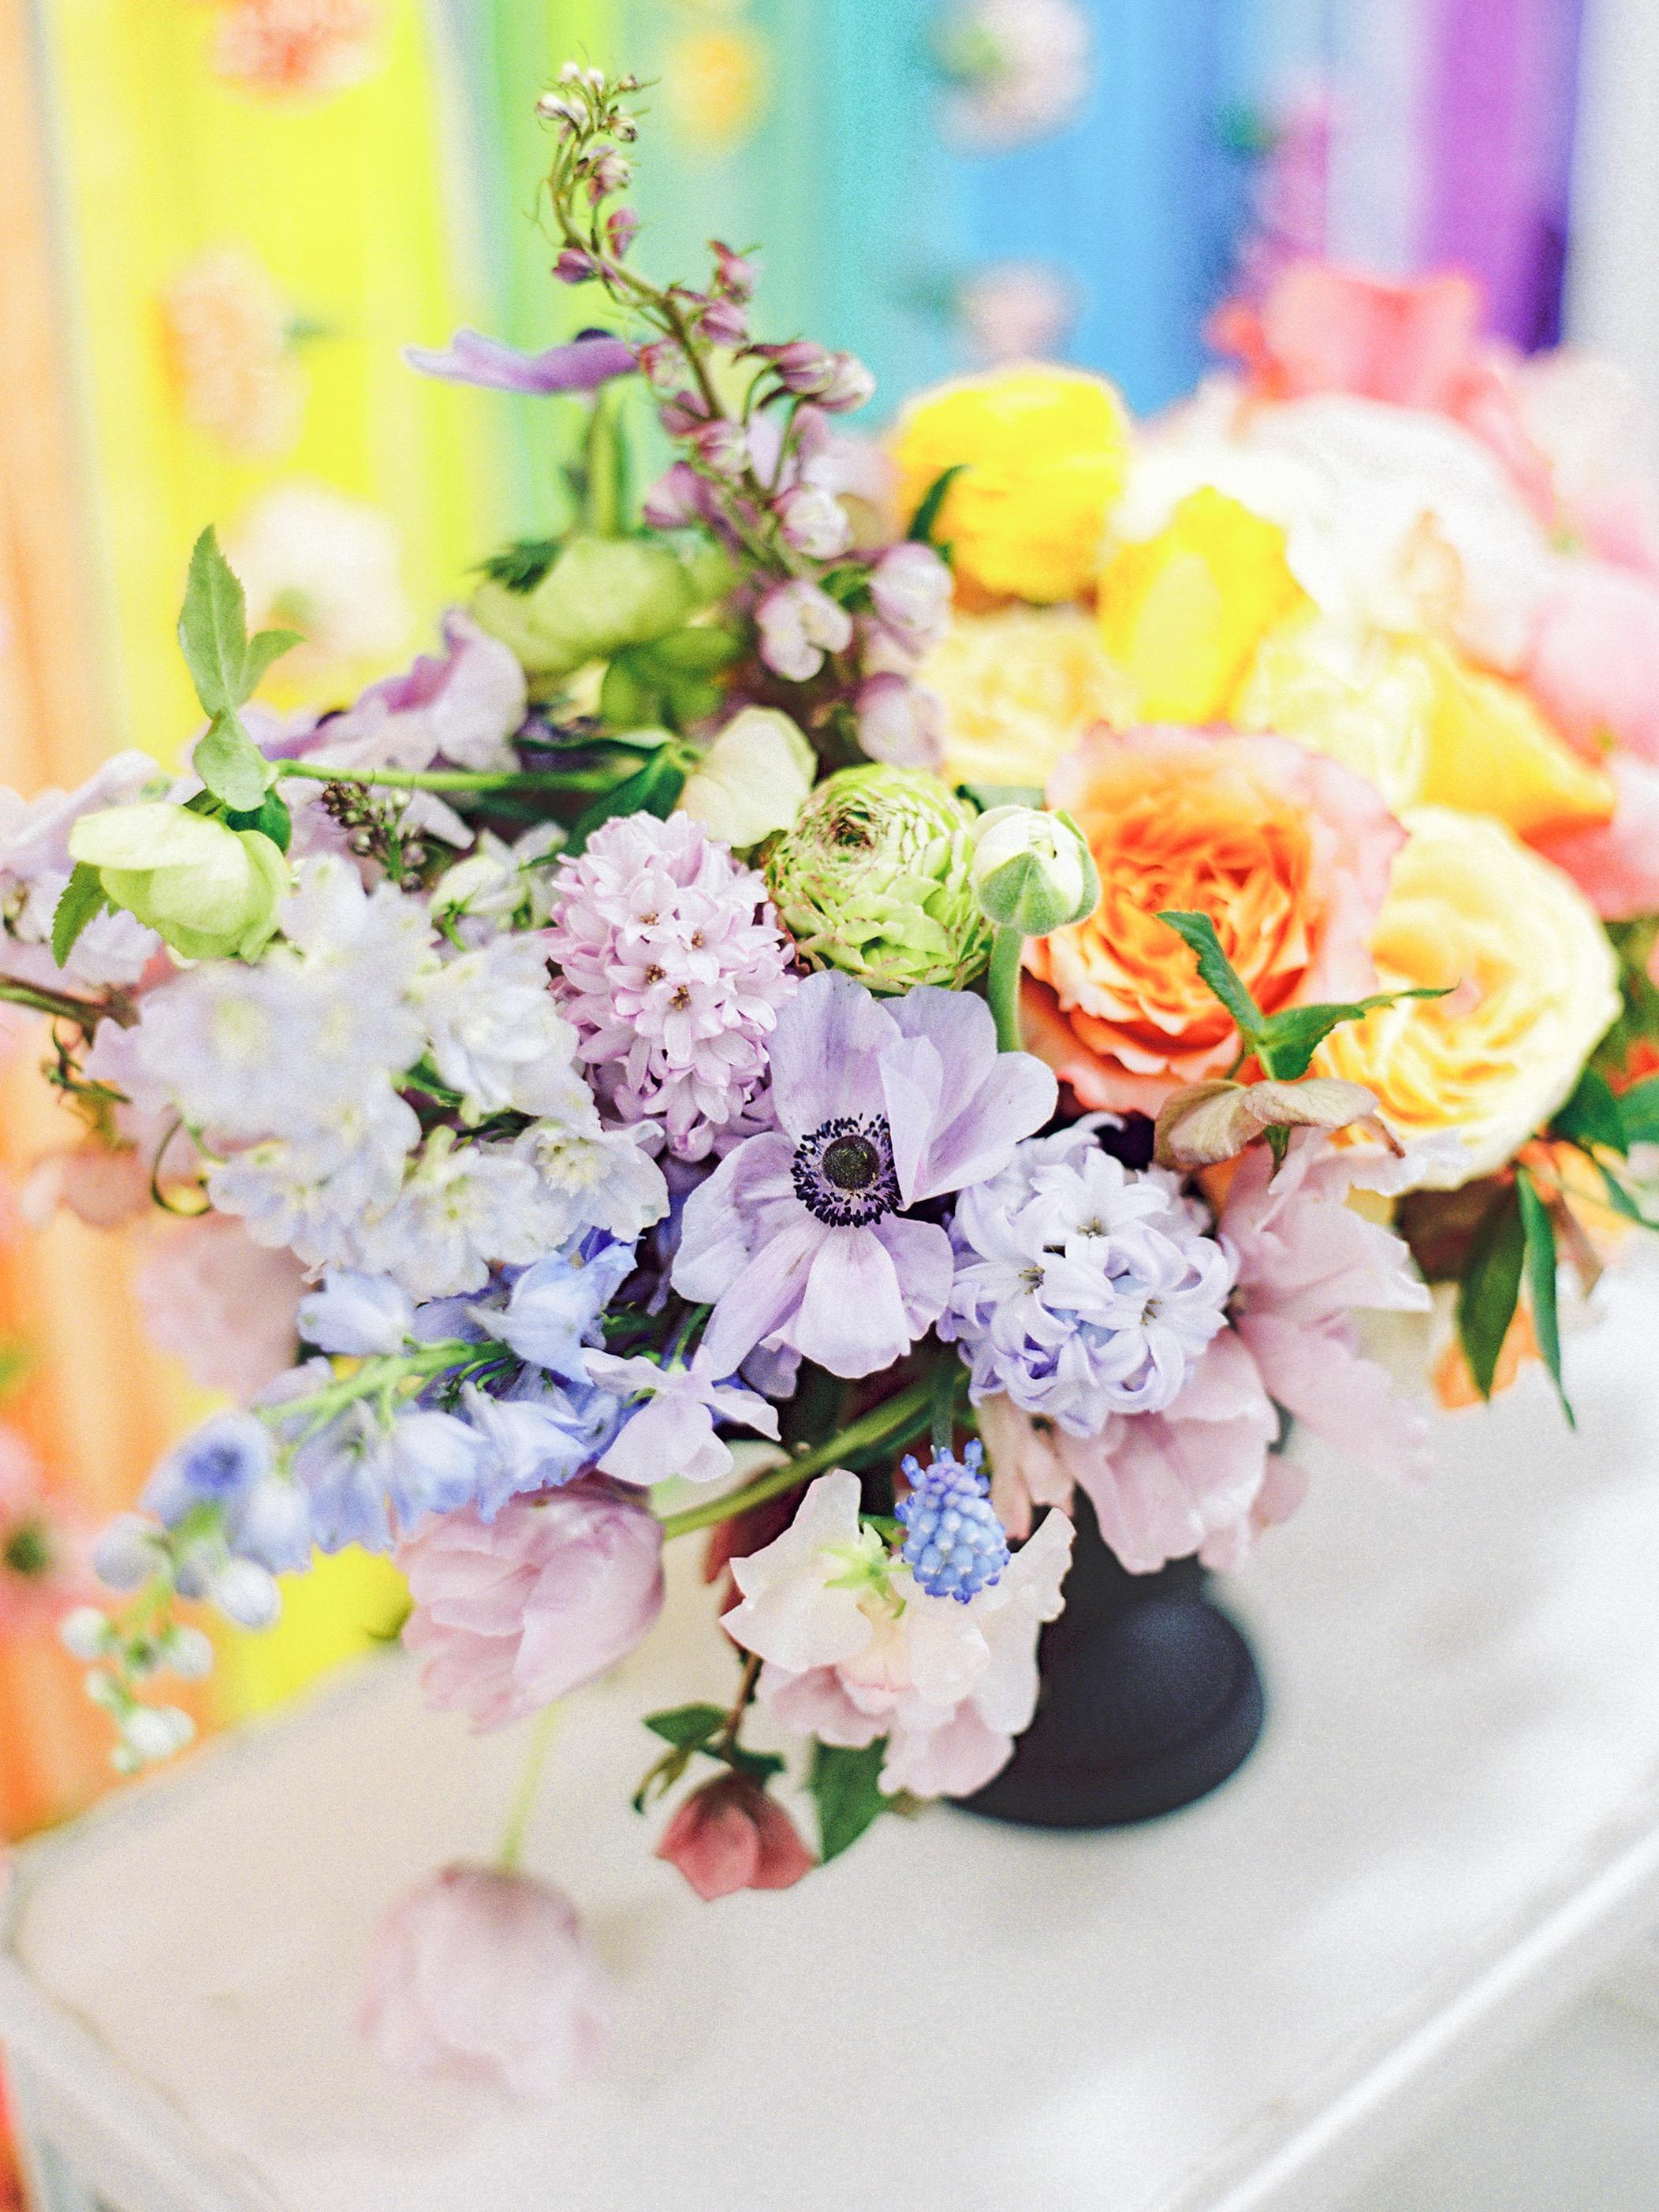 Rachel-May-Photography-42317-0053.jpg